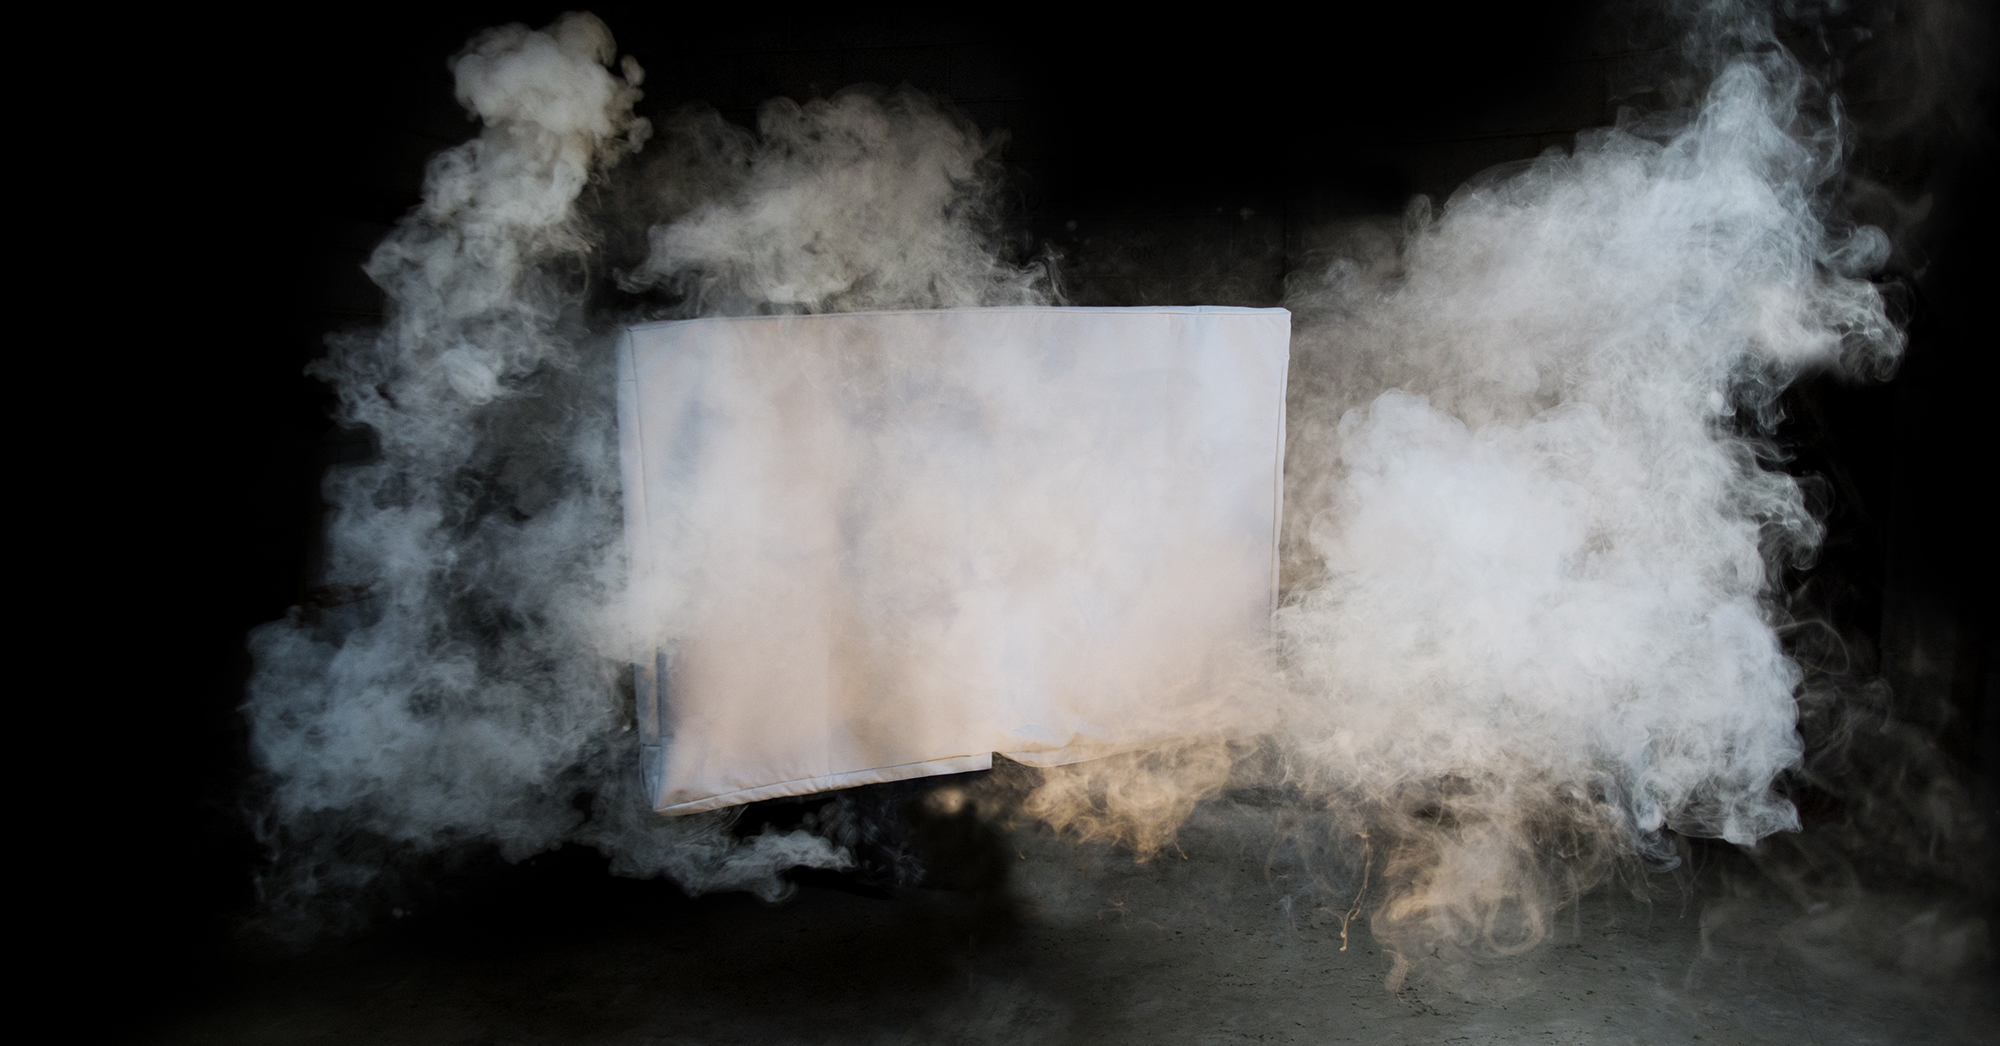 TV Cover that blocks dust